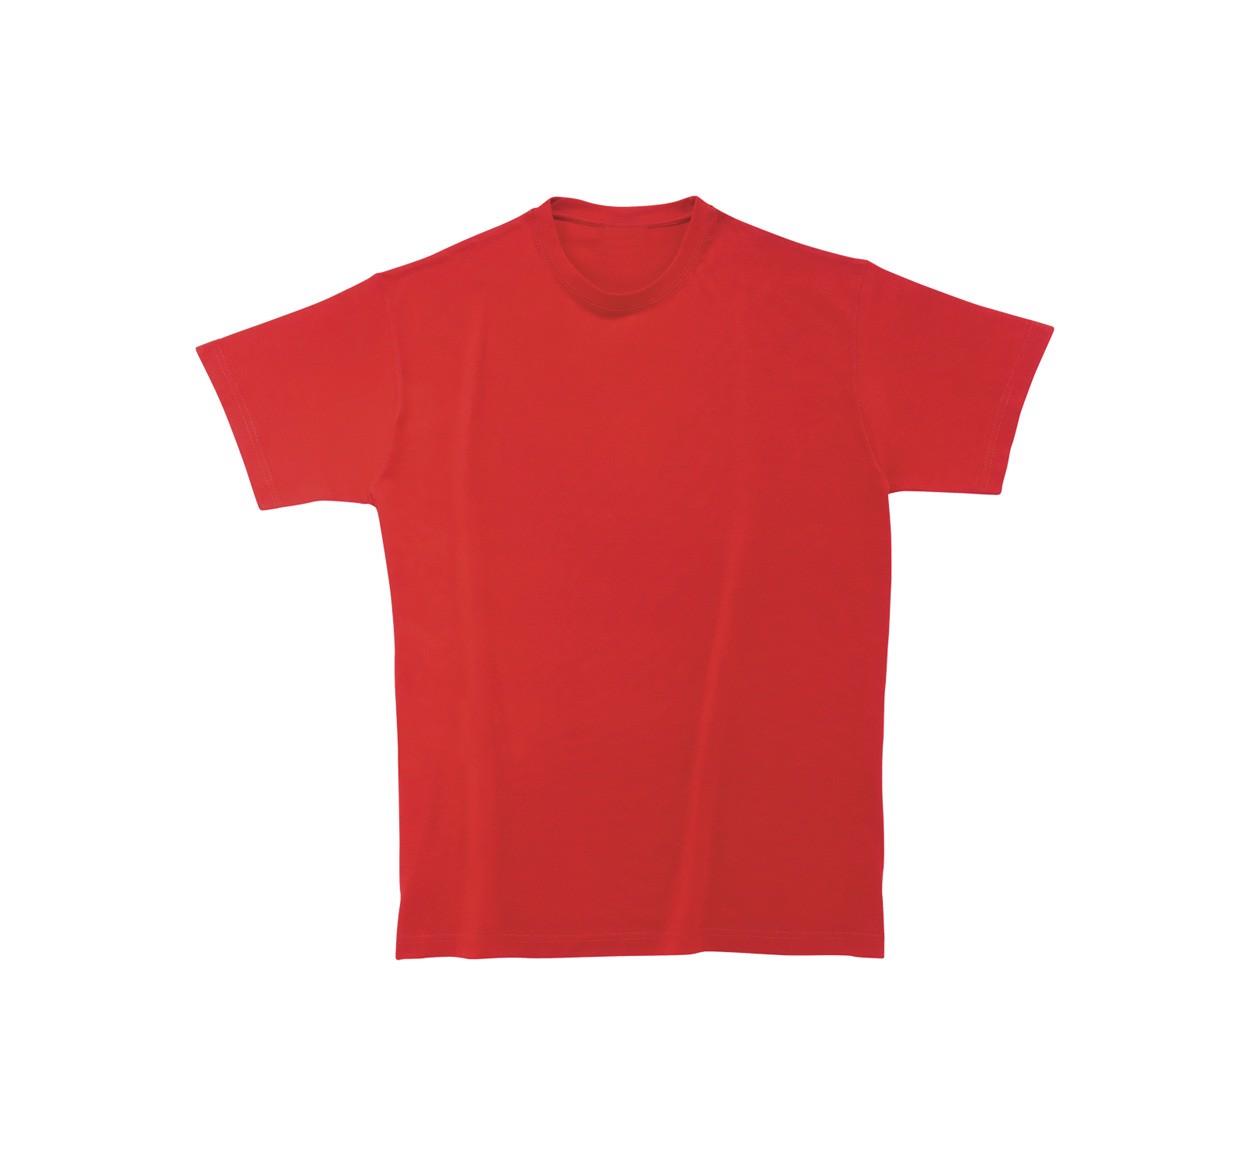 T-Shirt Heavy Cotton - Red / XXL